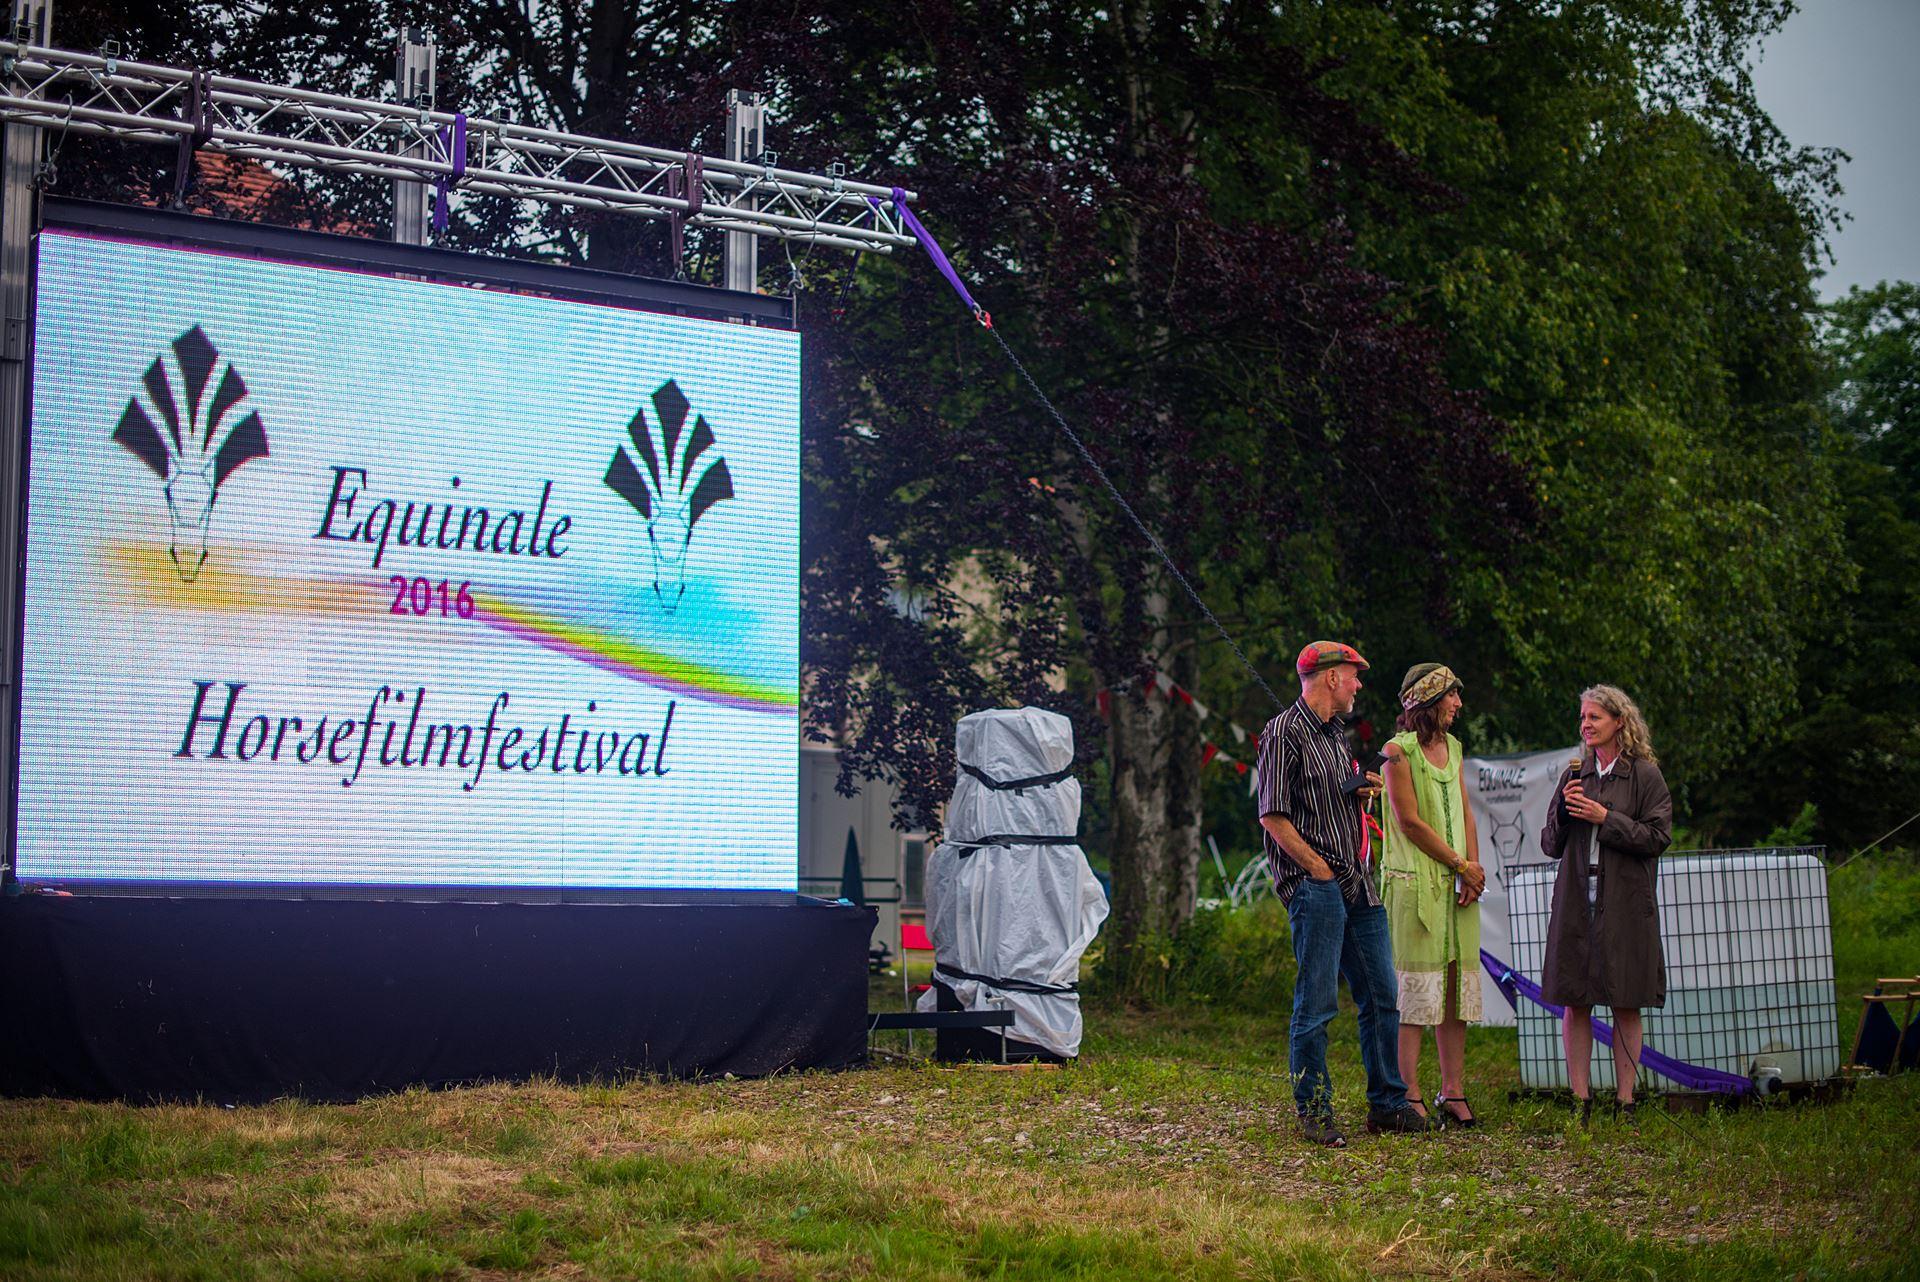 Gewinner Ralf Schauwacker, Nile v Pils (Equinale), Adelheid Borchardt (FN) Foto: Jens Seemann